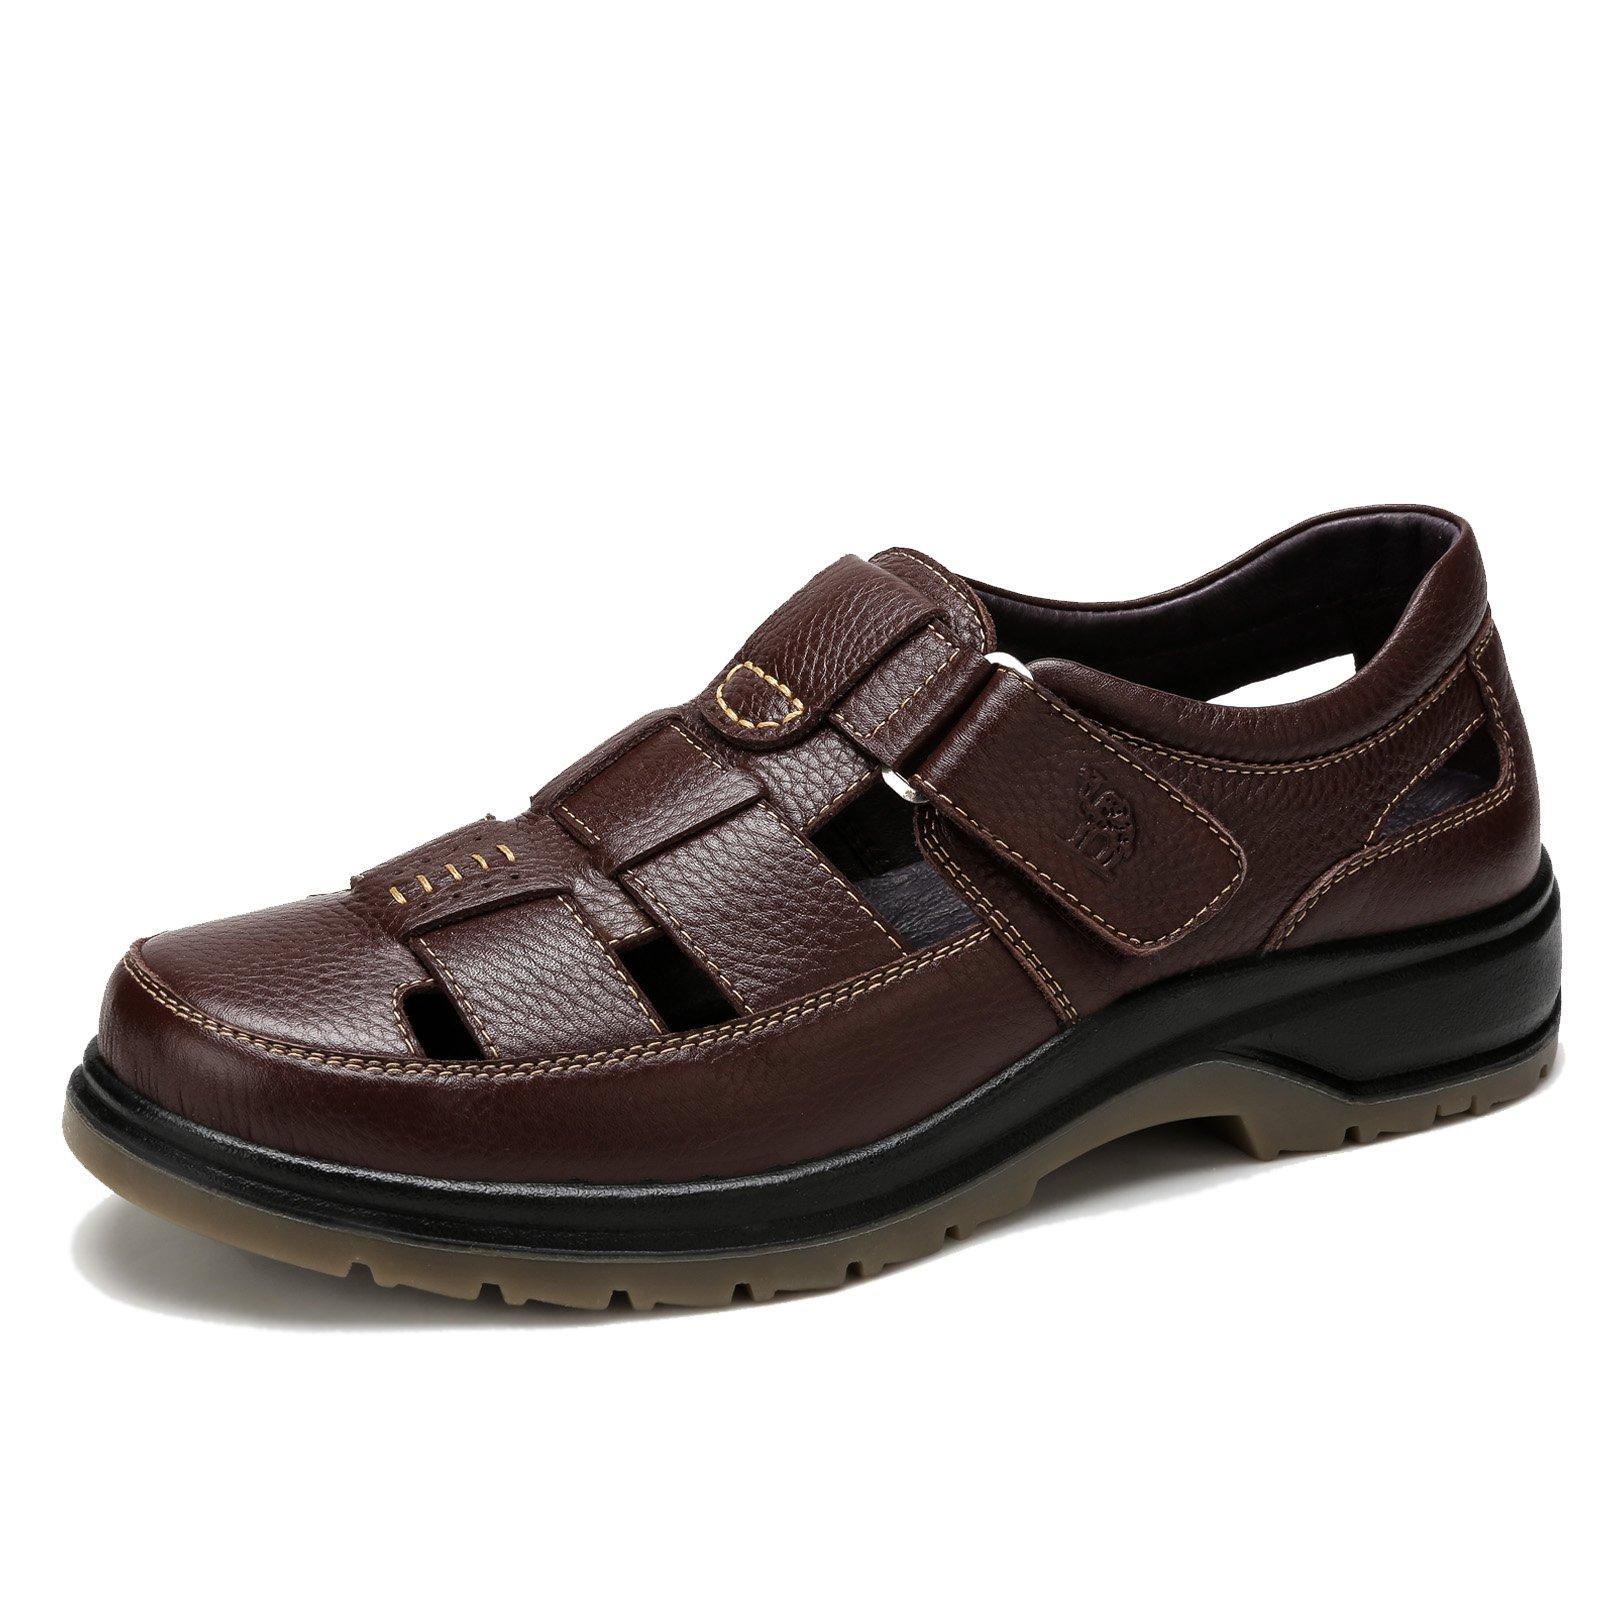 Camel Men's Fisherman Sandals Leather Breathable Close-Toe Sandal Non-Slip Adjustable Absorbing Outdoor Sports Sandals, Brown 260mm